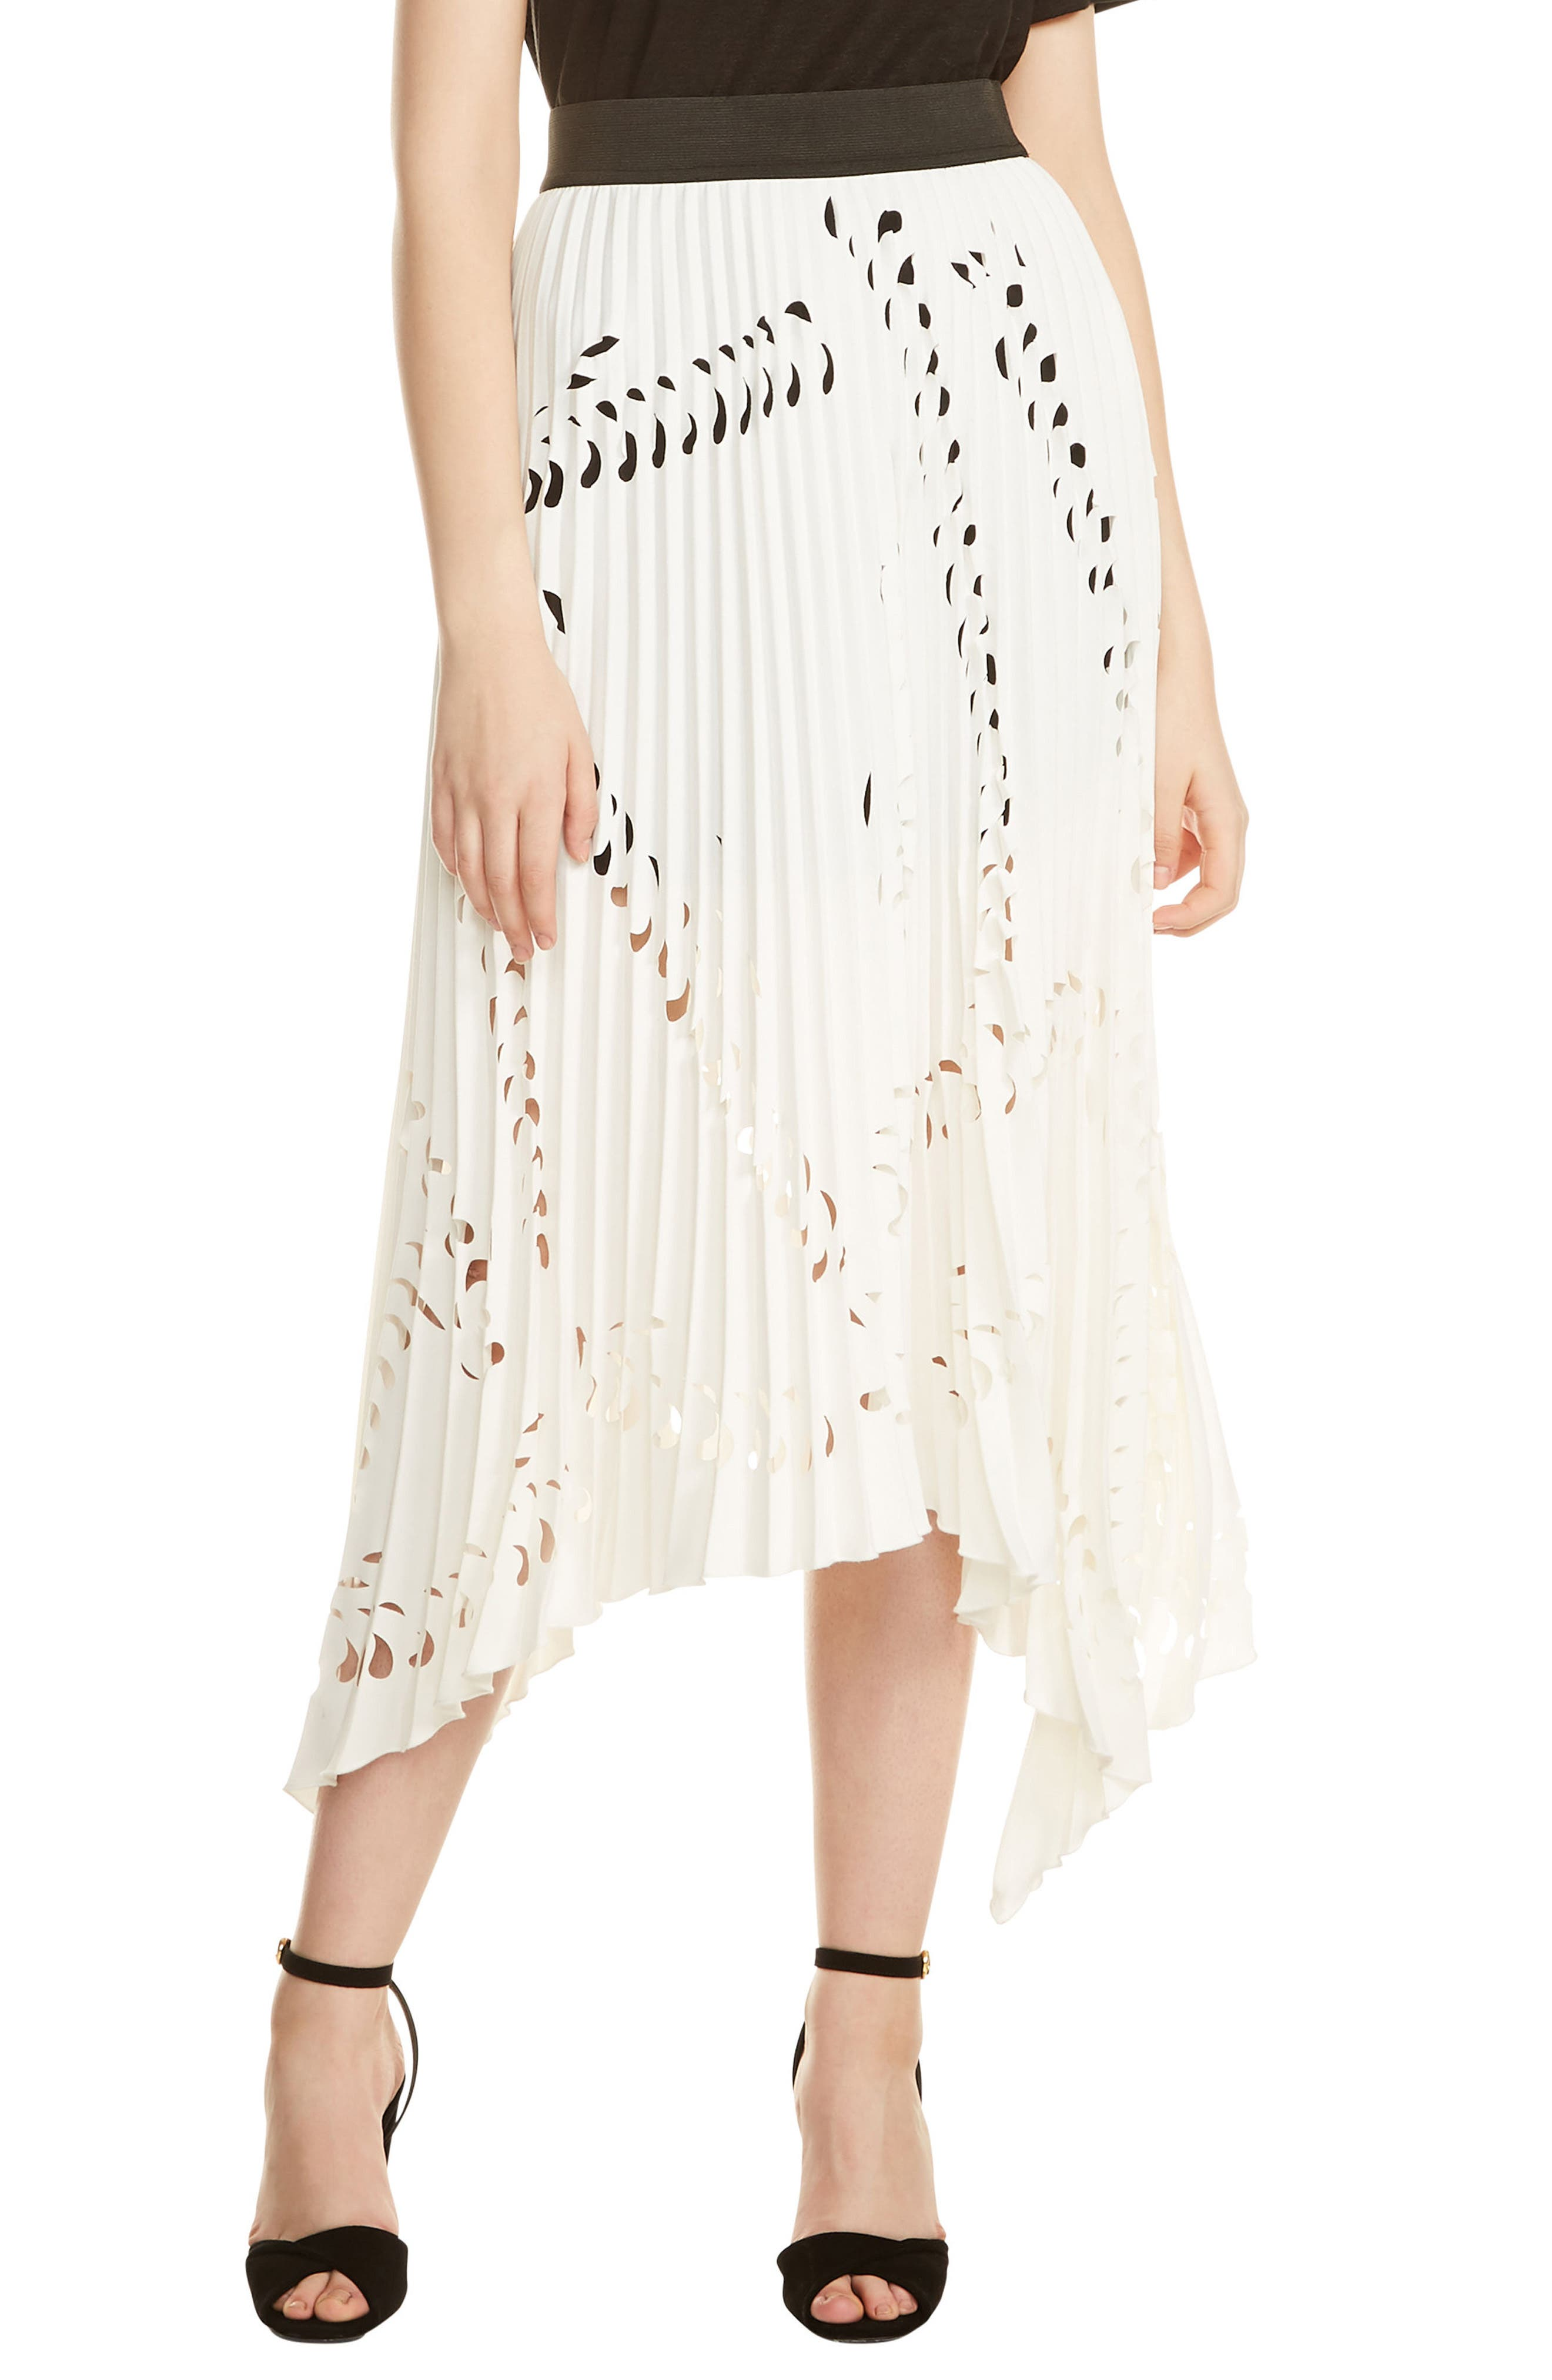 Jeflexe Cutout Pleat Midi Skirt,                         Main,                         color, Blanc